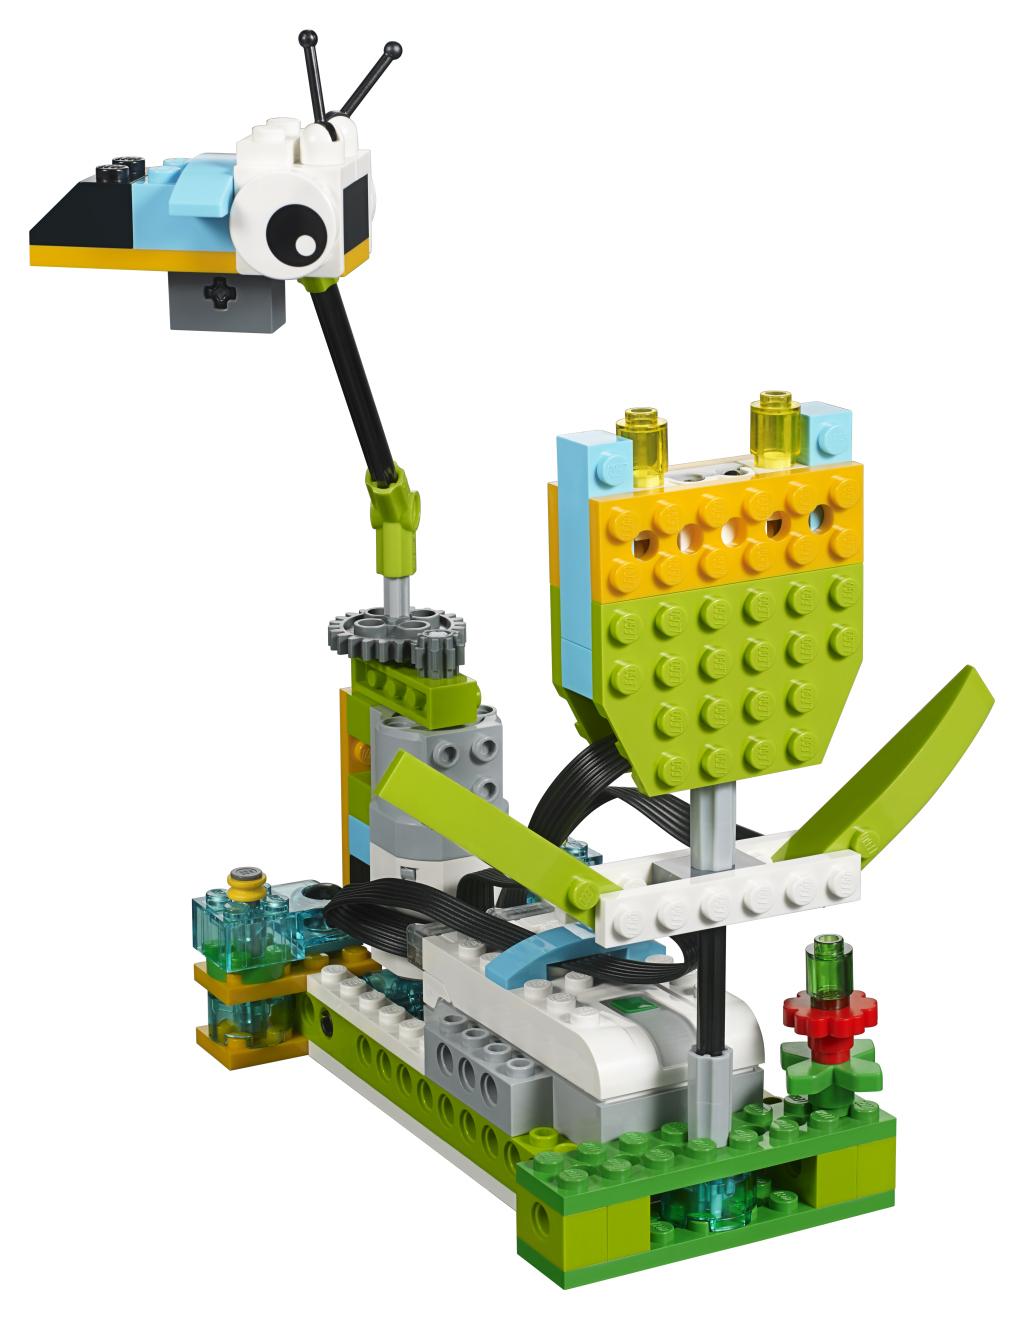 CES 2016: Lego's WeDo 2.0 robotics kit imparts science and ...